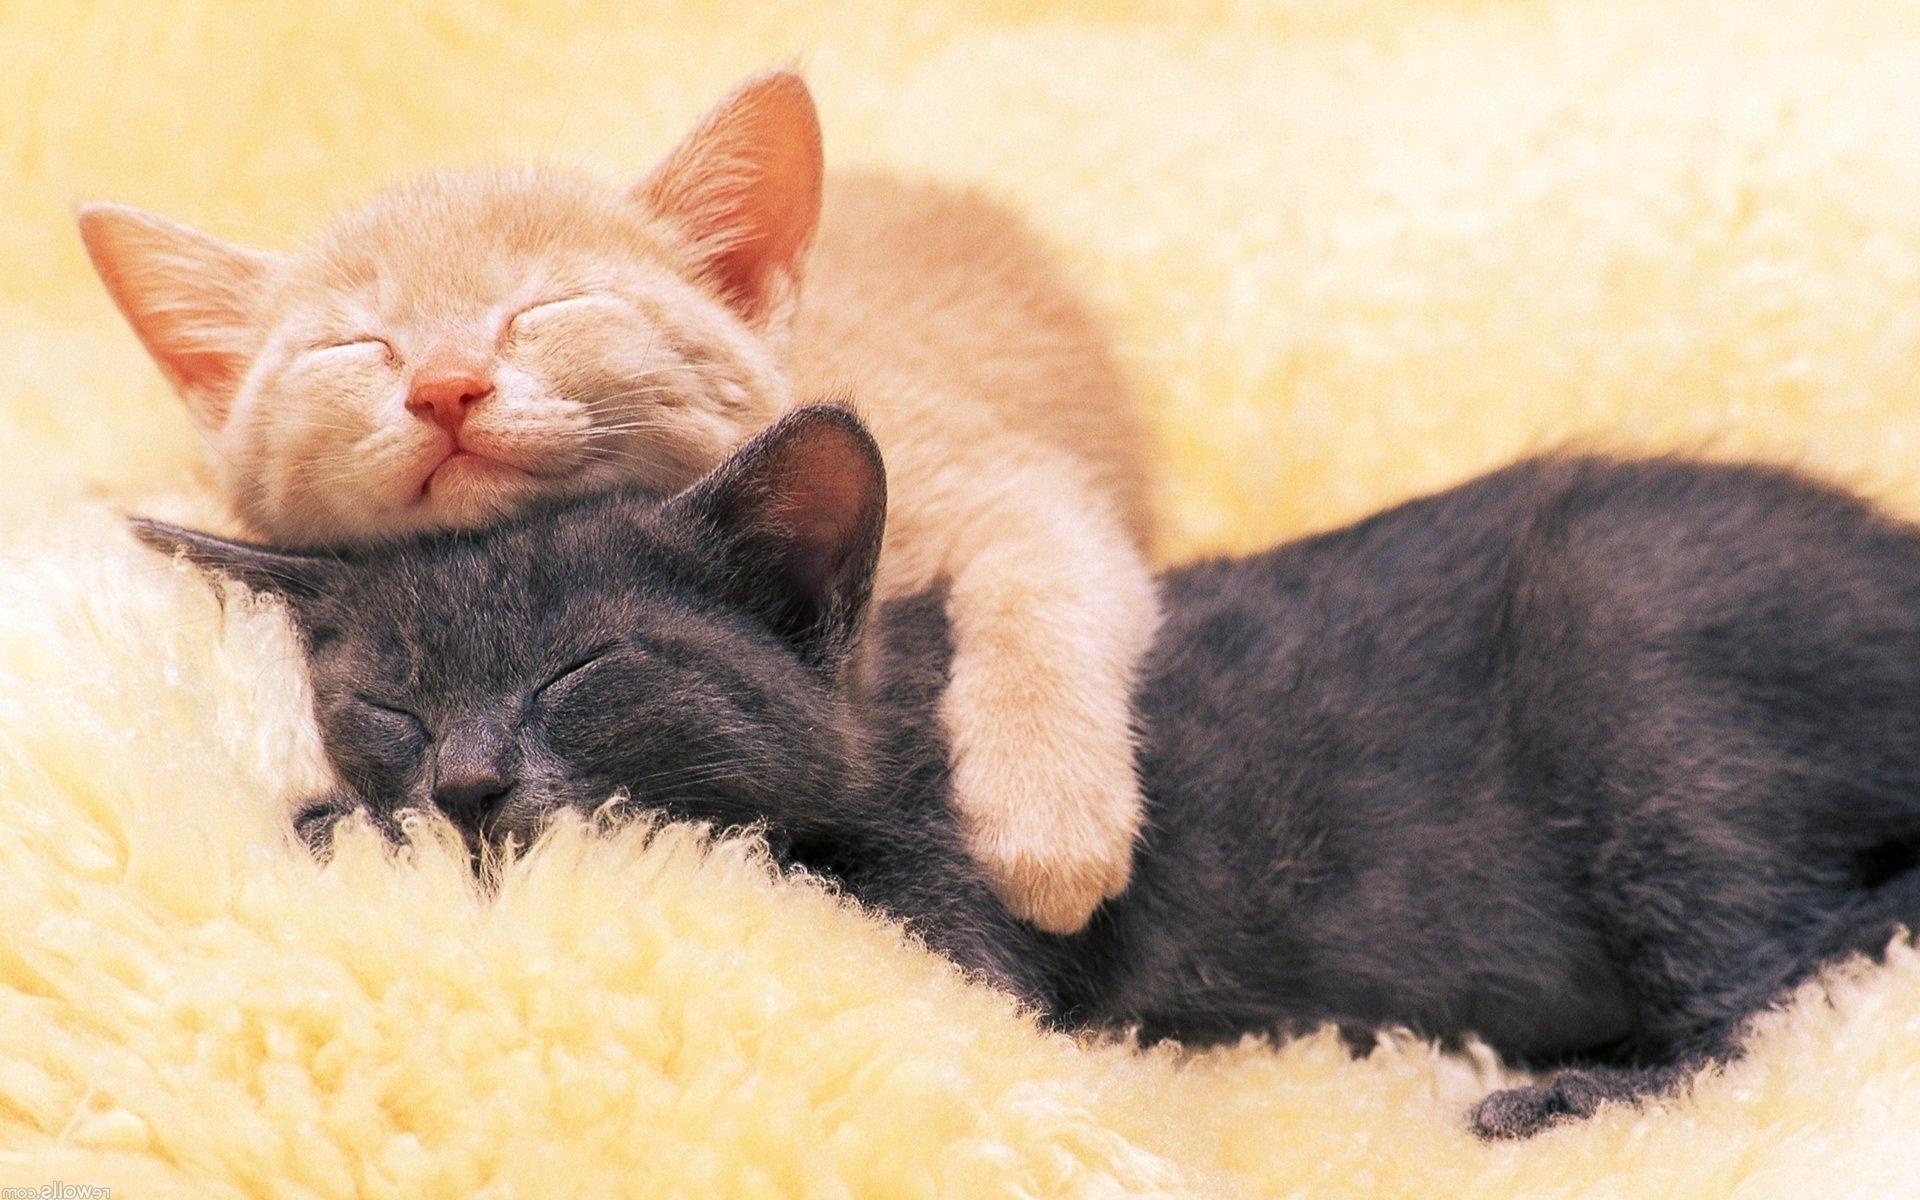 Sleeping Cats HD Desktop Wallpapers 4k HD